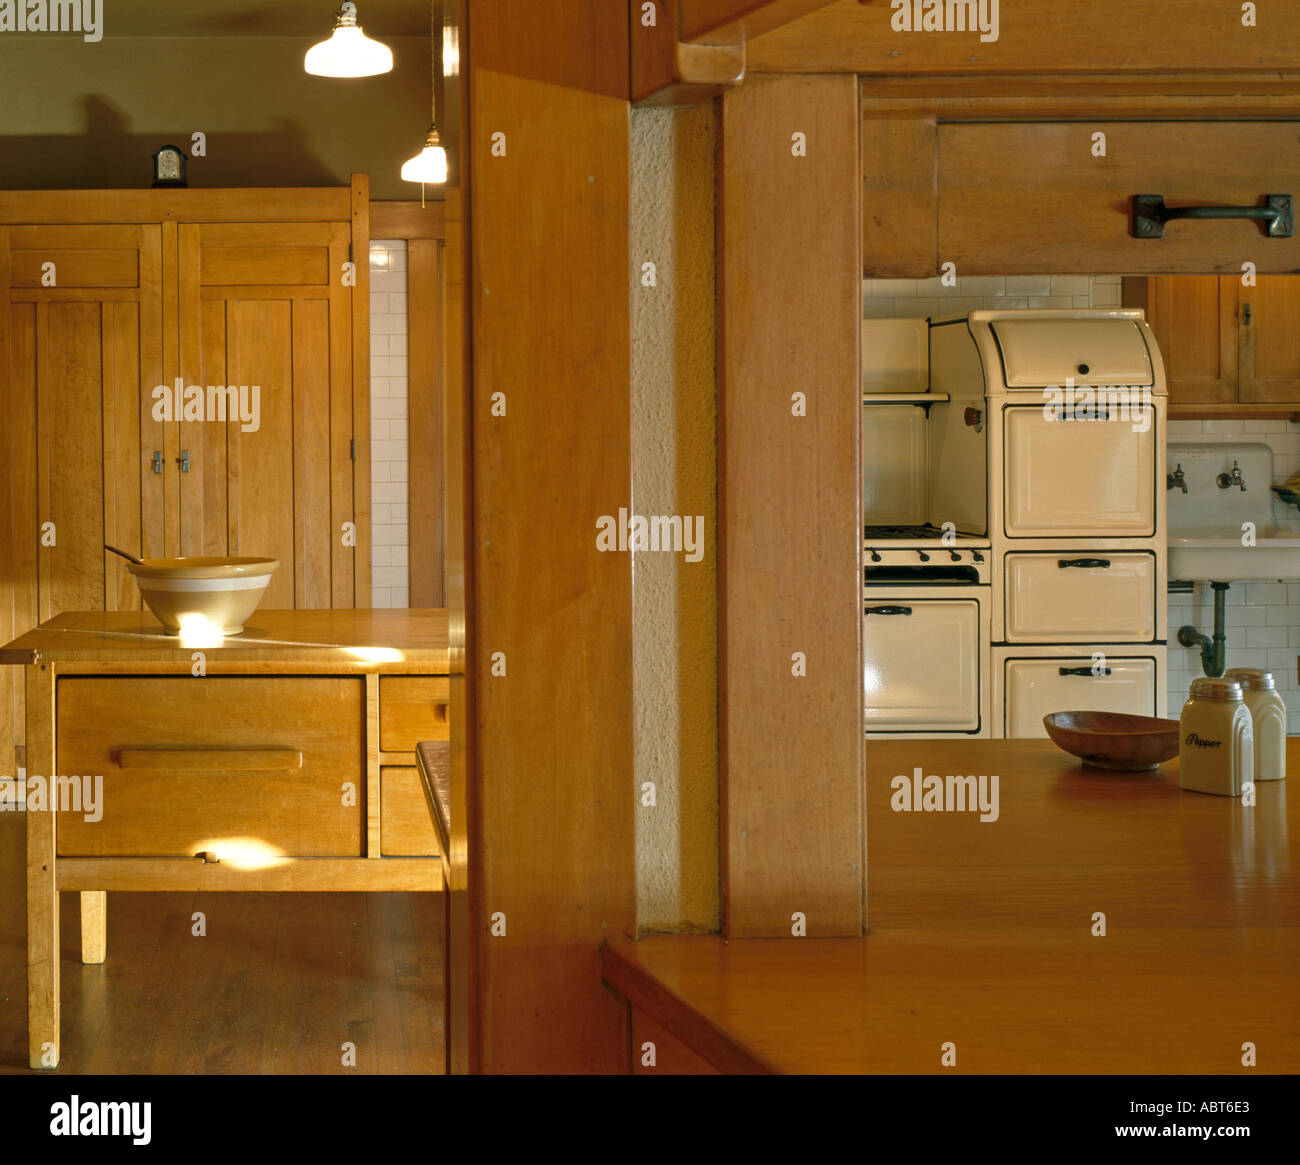 Interiors Traditional Cream Kitchens Stockfotos & Interiors ...